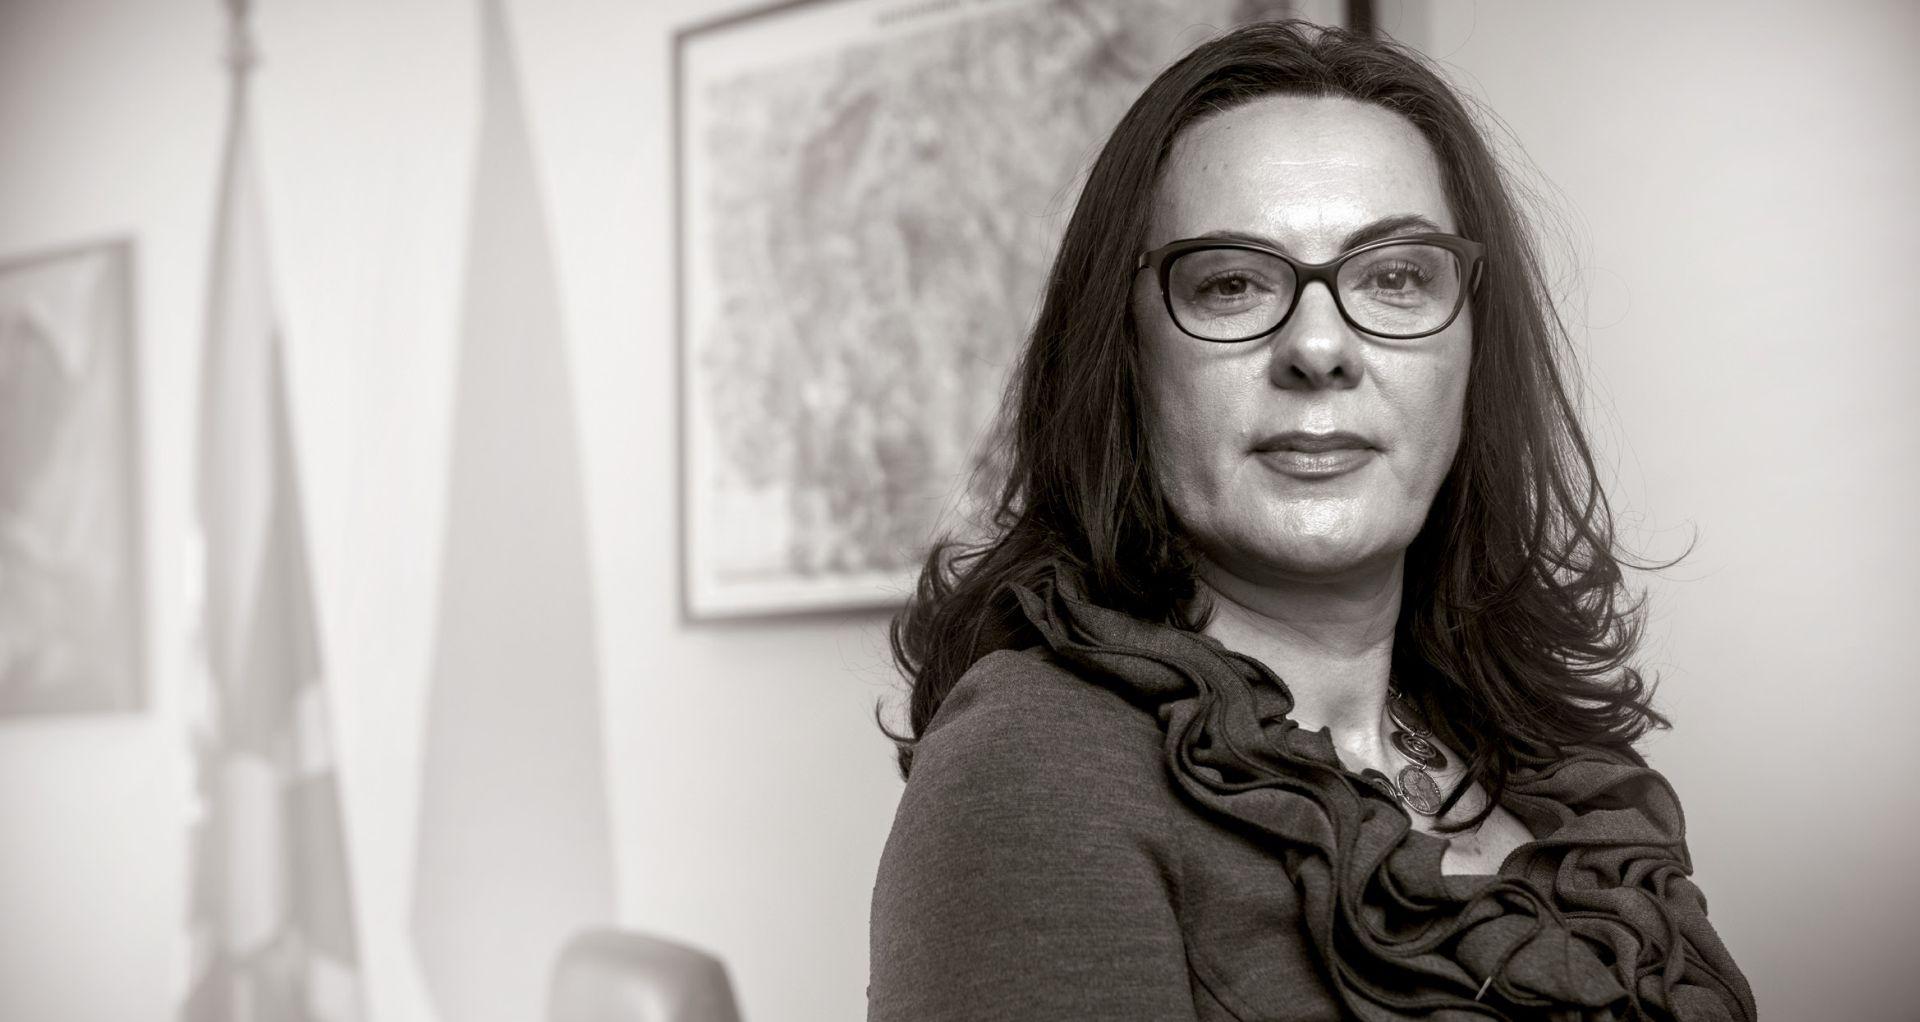 INTERVIEW: DANIELA KARAGJOZOSKA 'Makedonija ostvaruje rast iako ima tehničku vladu, izbjeglice i bojkot Grčke'